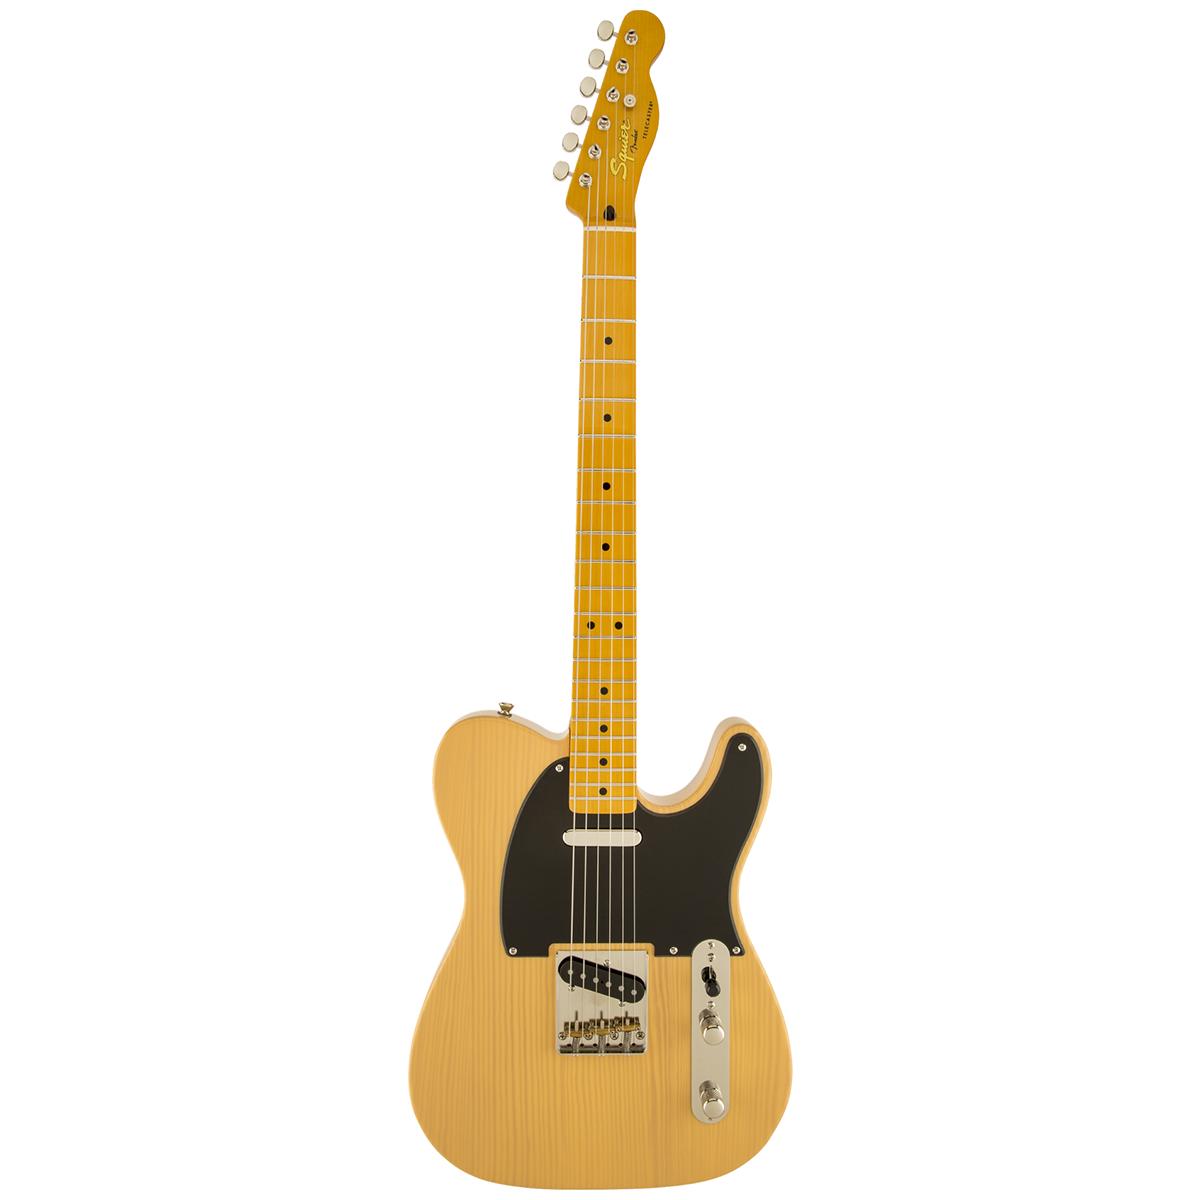 Billede af FenderSquier ClassicVibeTelecaster50s,MN,BTB el-guitar butterscotchblonde